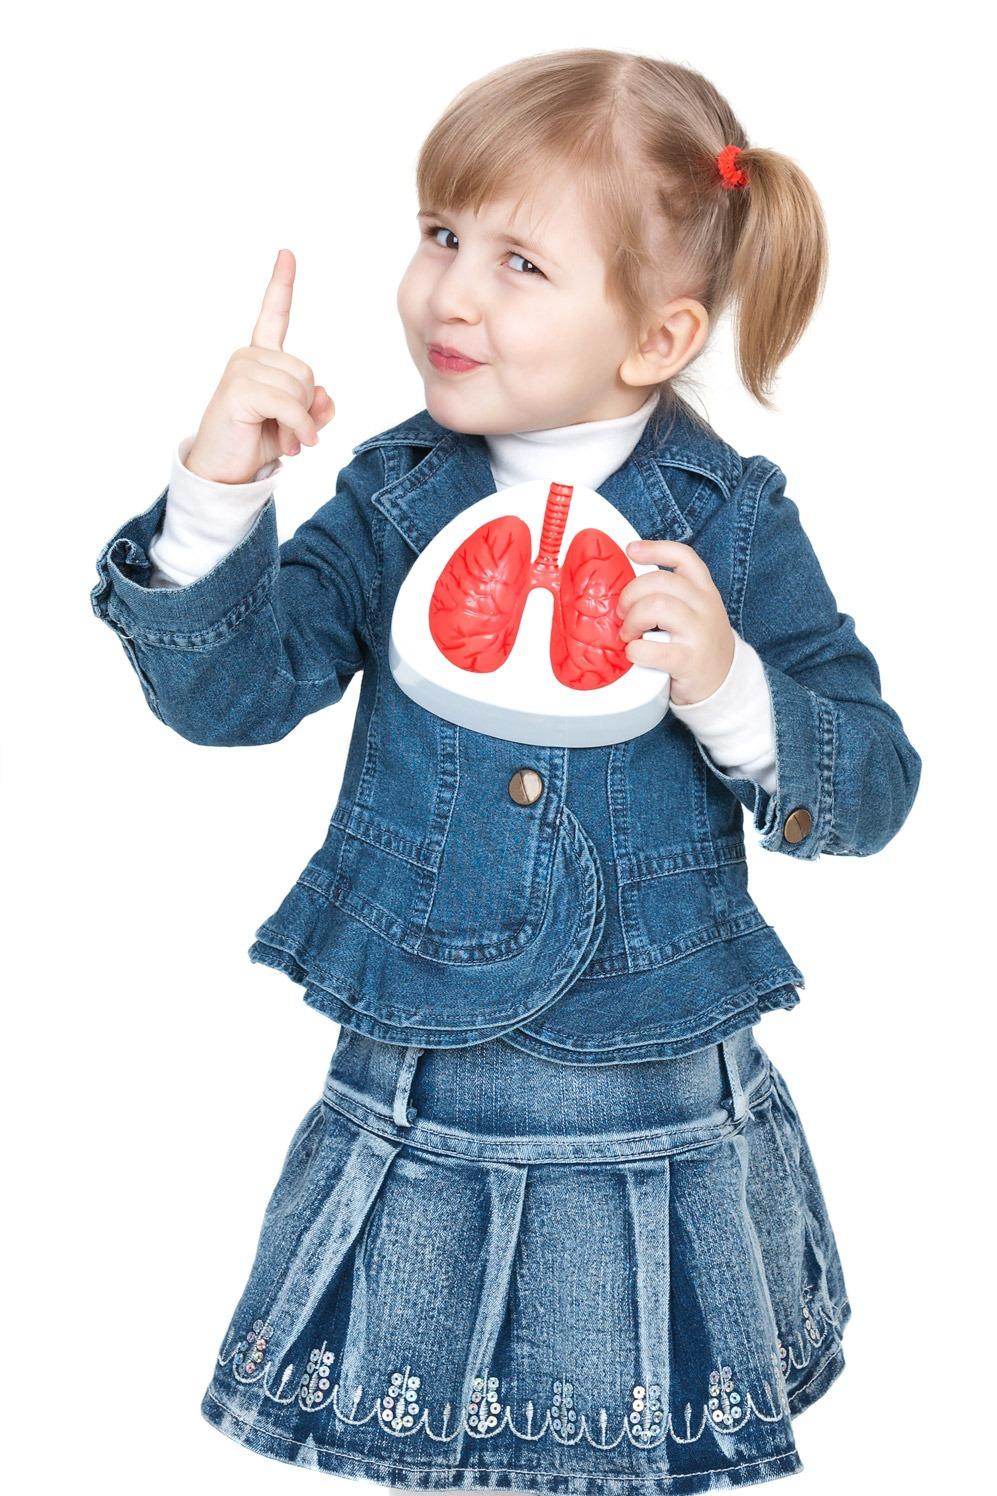 Breathe LA - Archived Programs - Lung Power